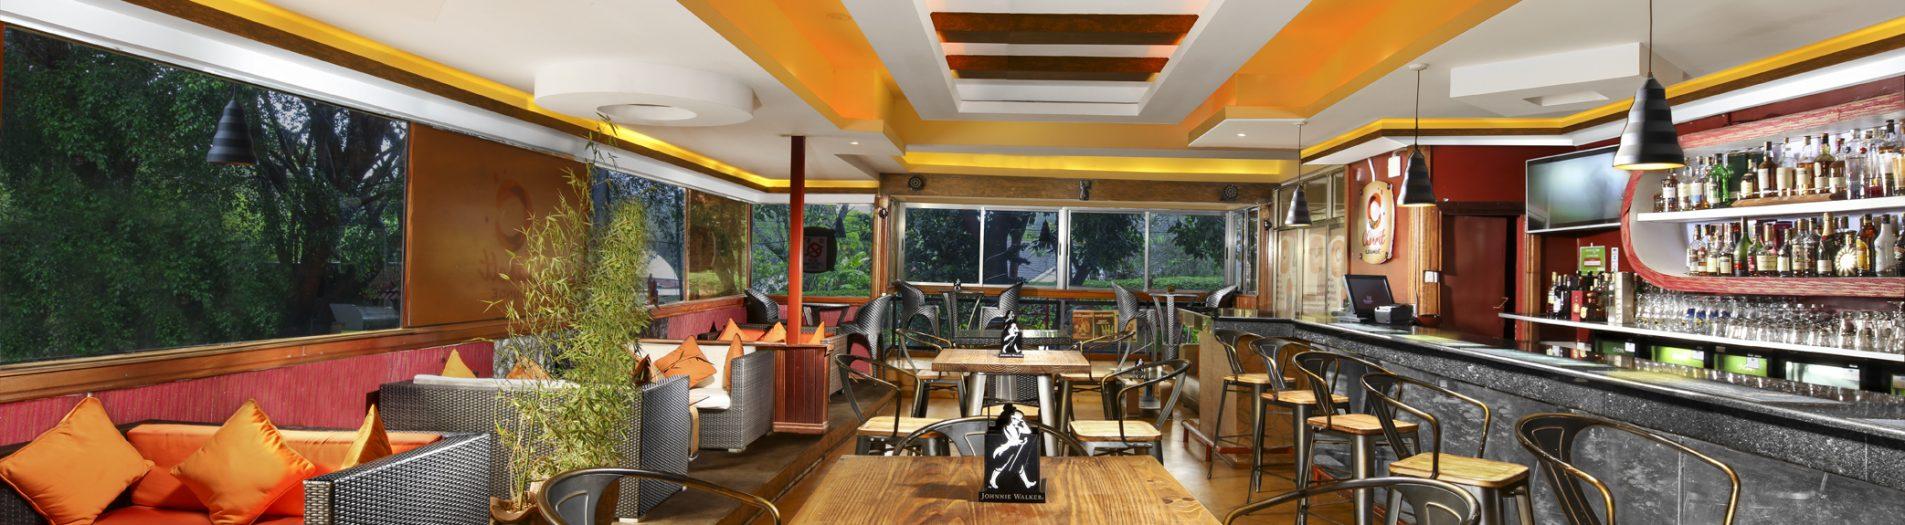 Claret Lounge